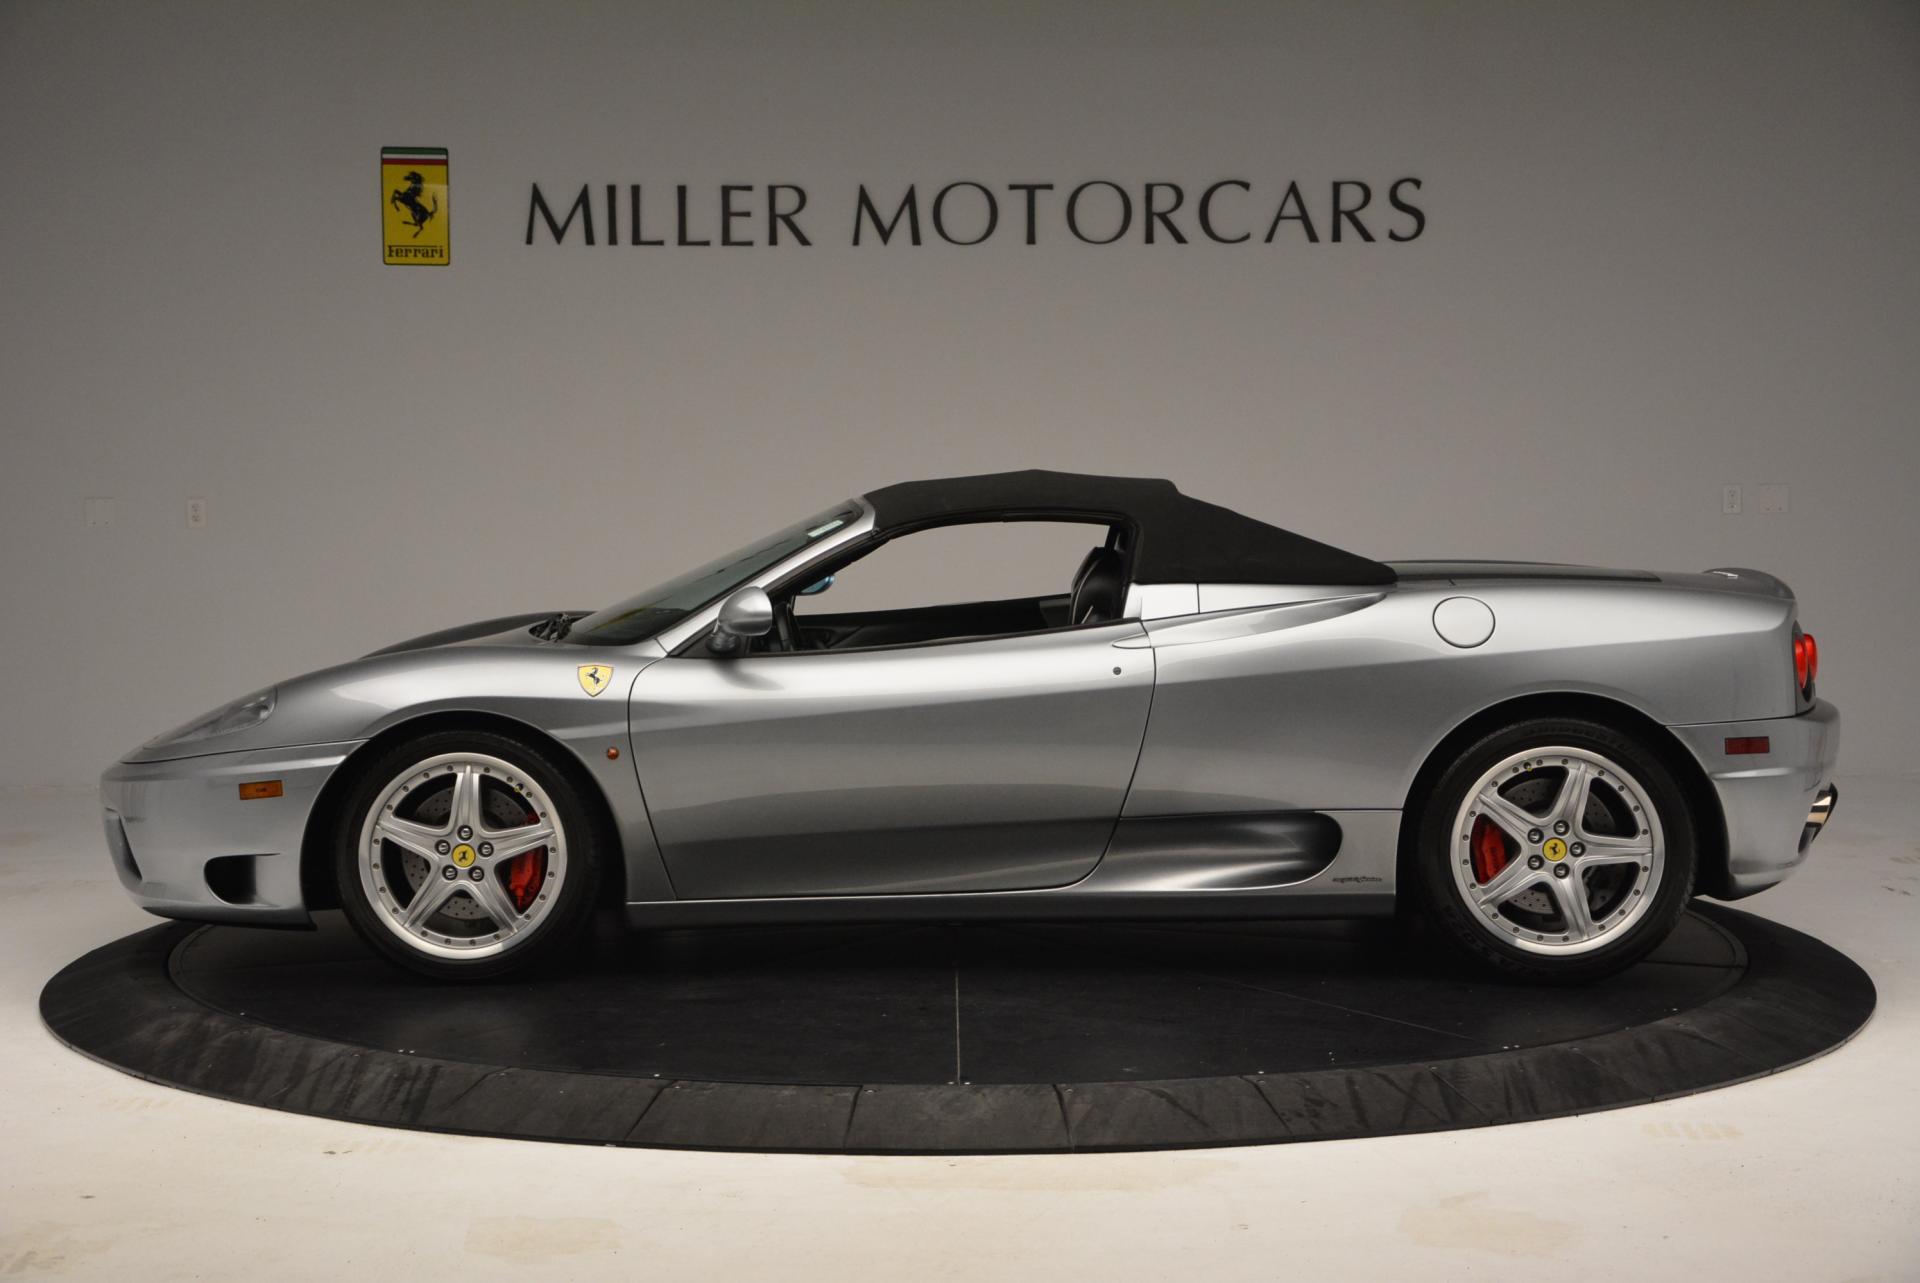 Used 2004 Ferrari 360 Spider 6-Speed Manual  For Sale In Greenwich, CT. Alfa Romeo of Greenwich, 4317 138_p15